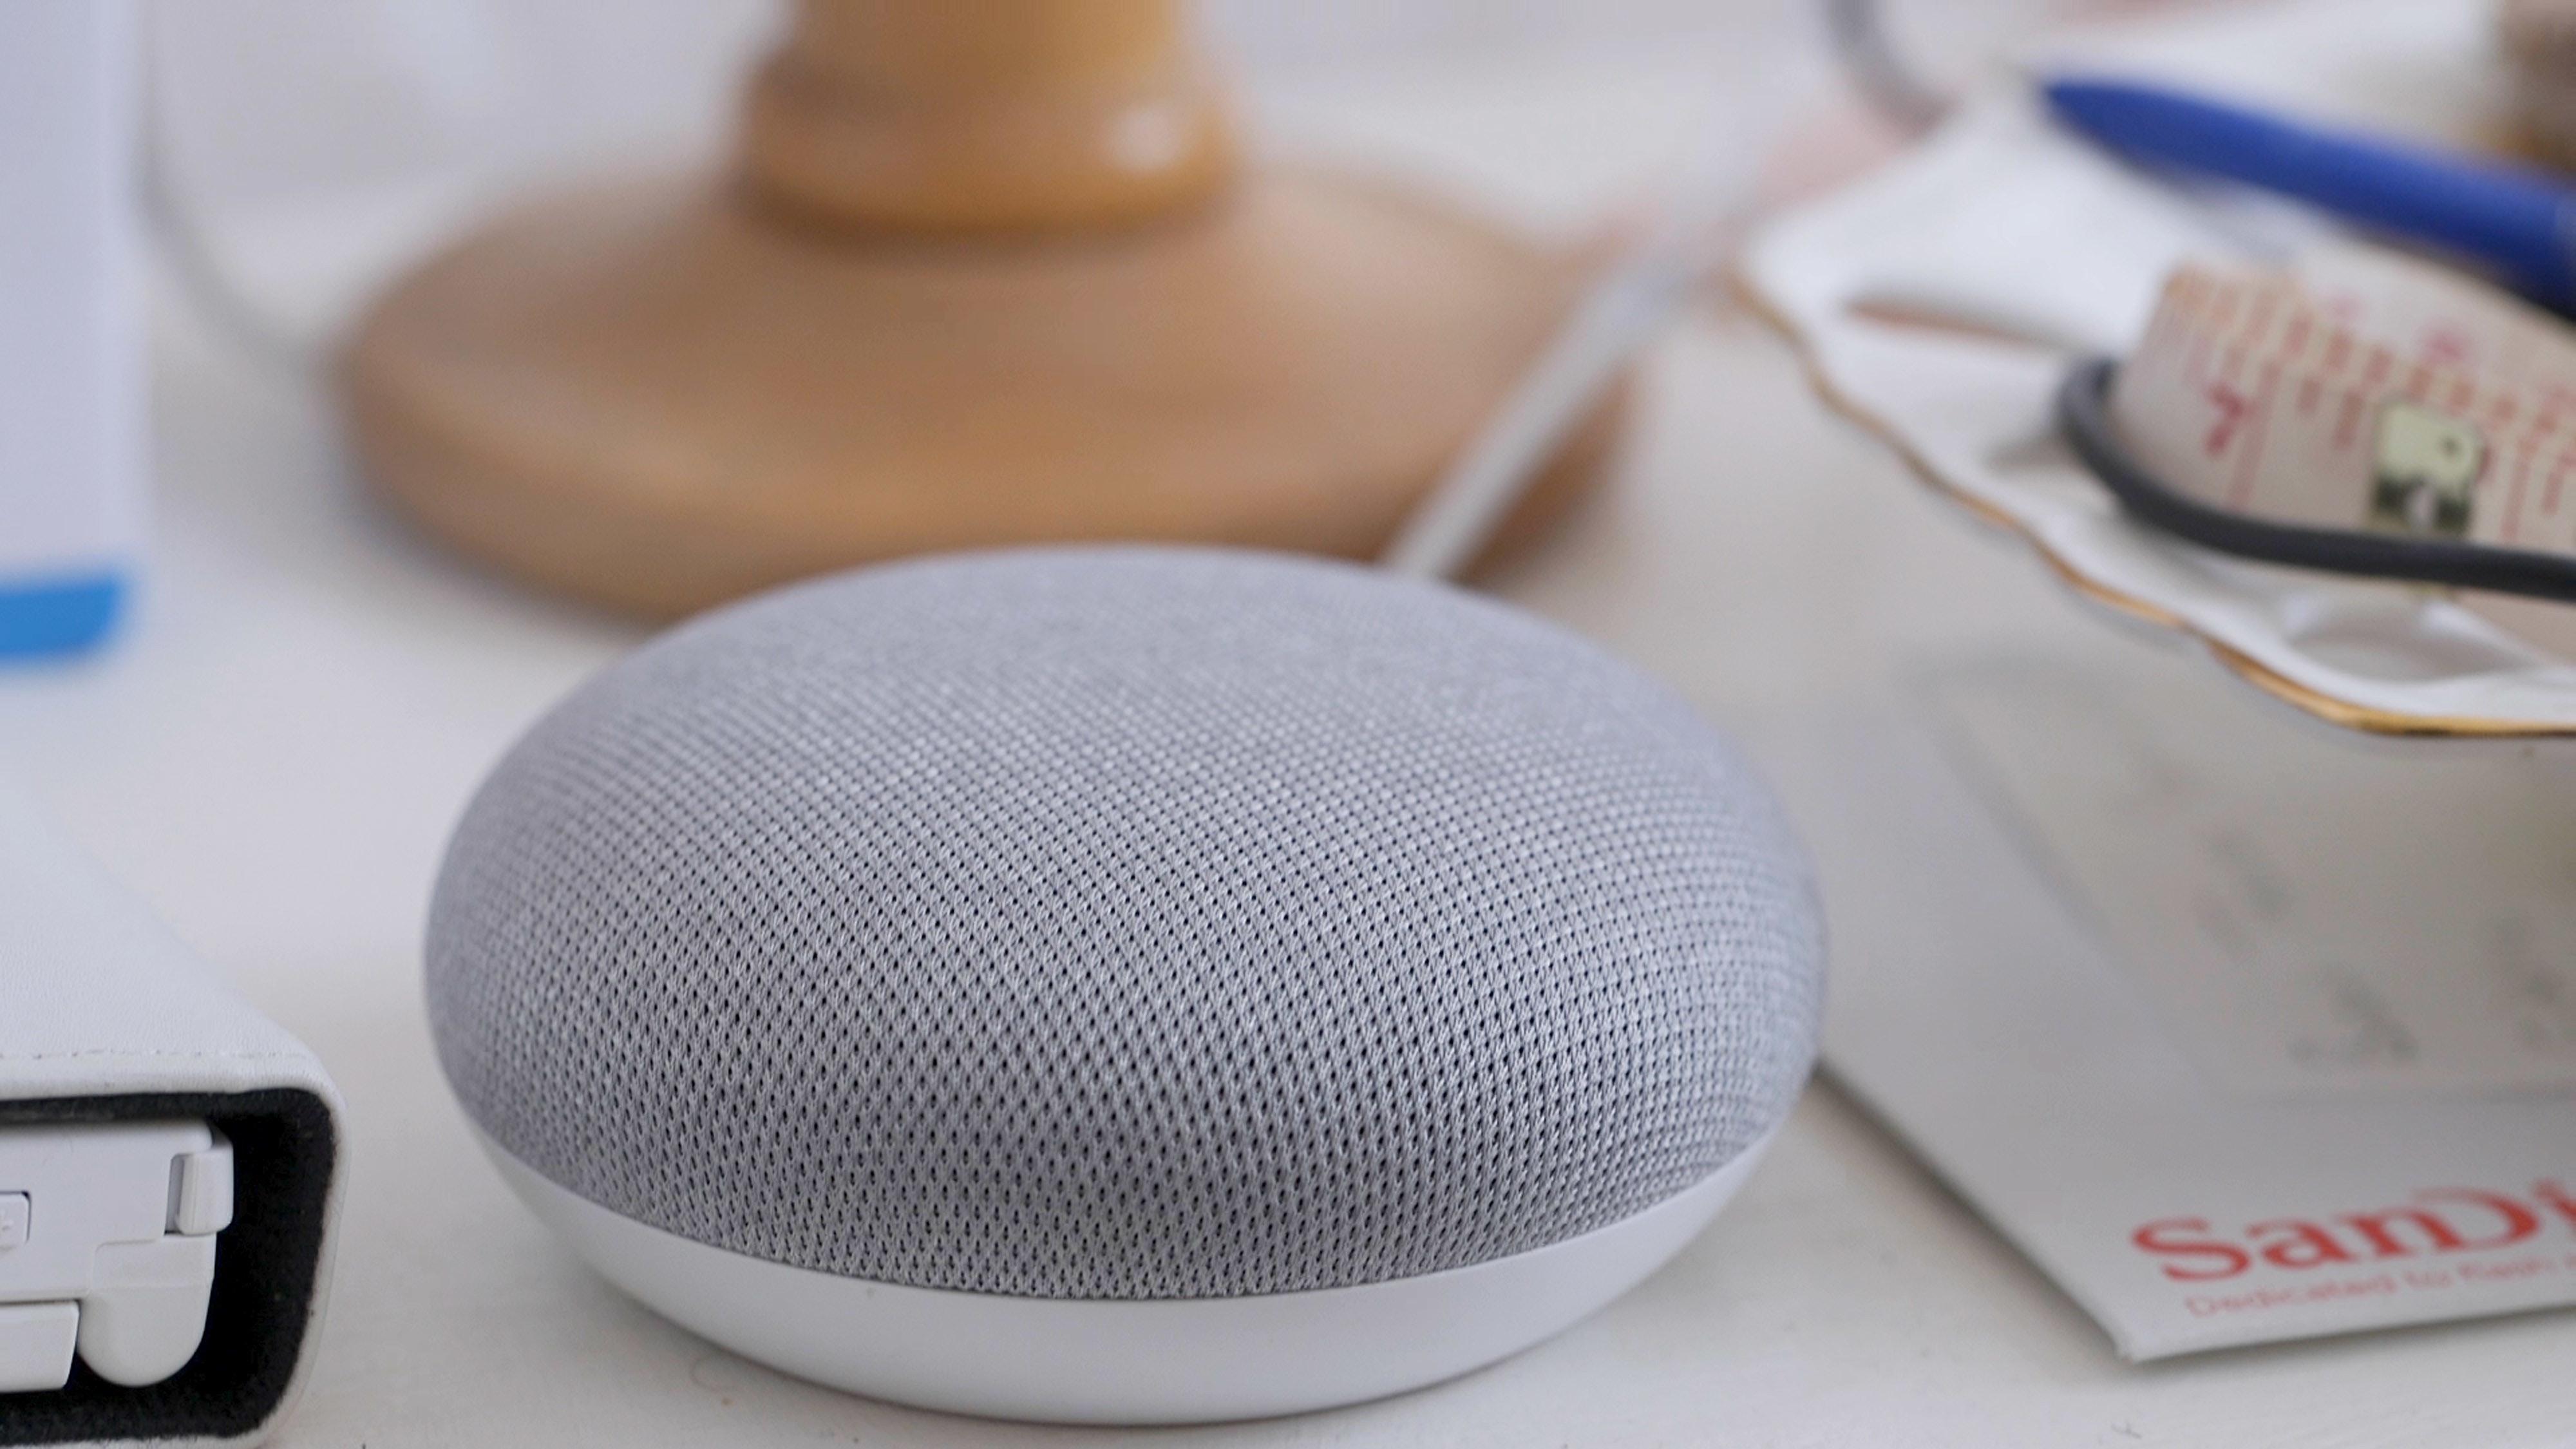 NatWest trials Google voice tech